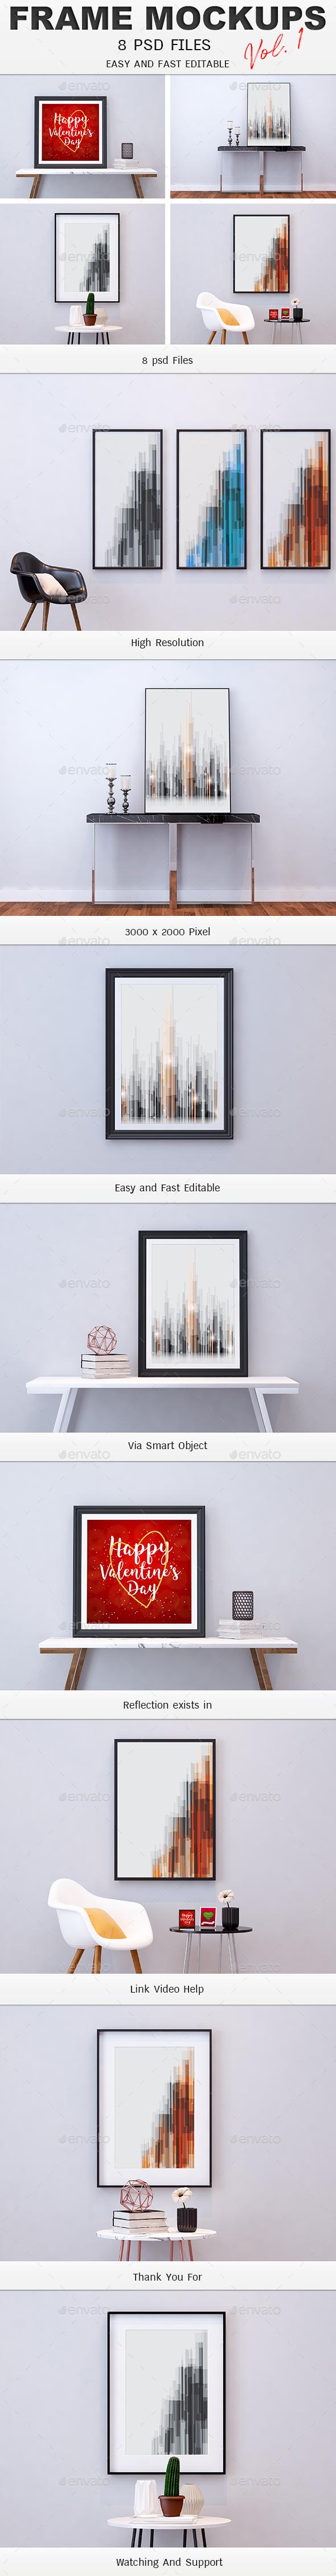 Photo Frame Mockups Vol.1 - Product Mock-Ups Graphics